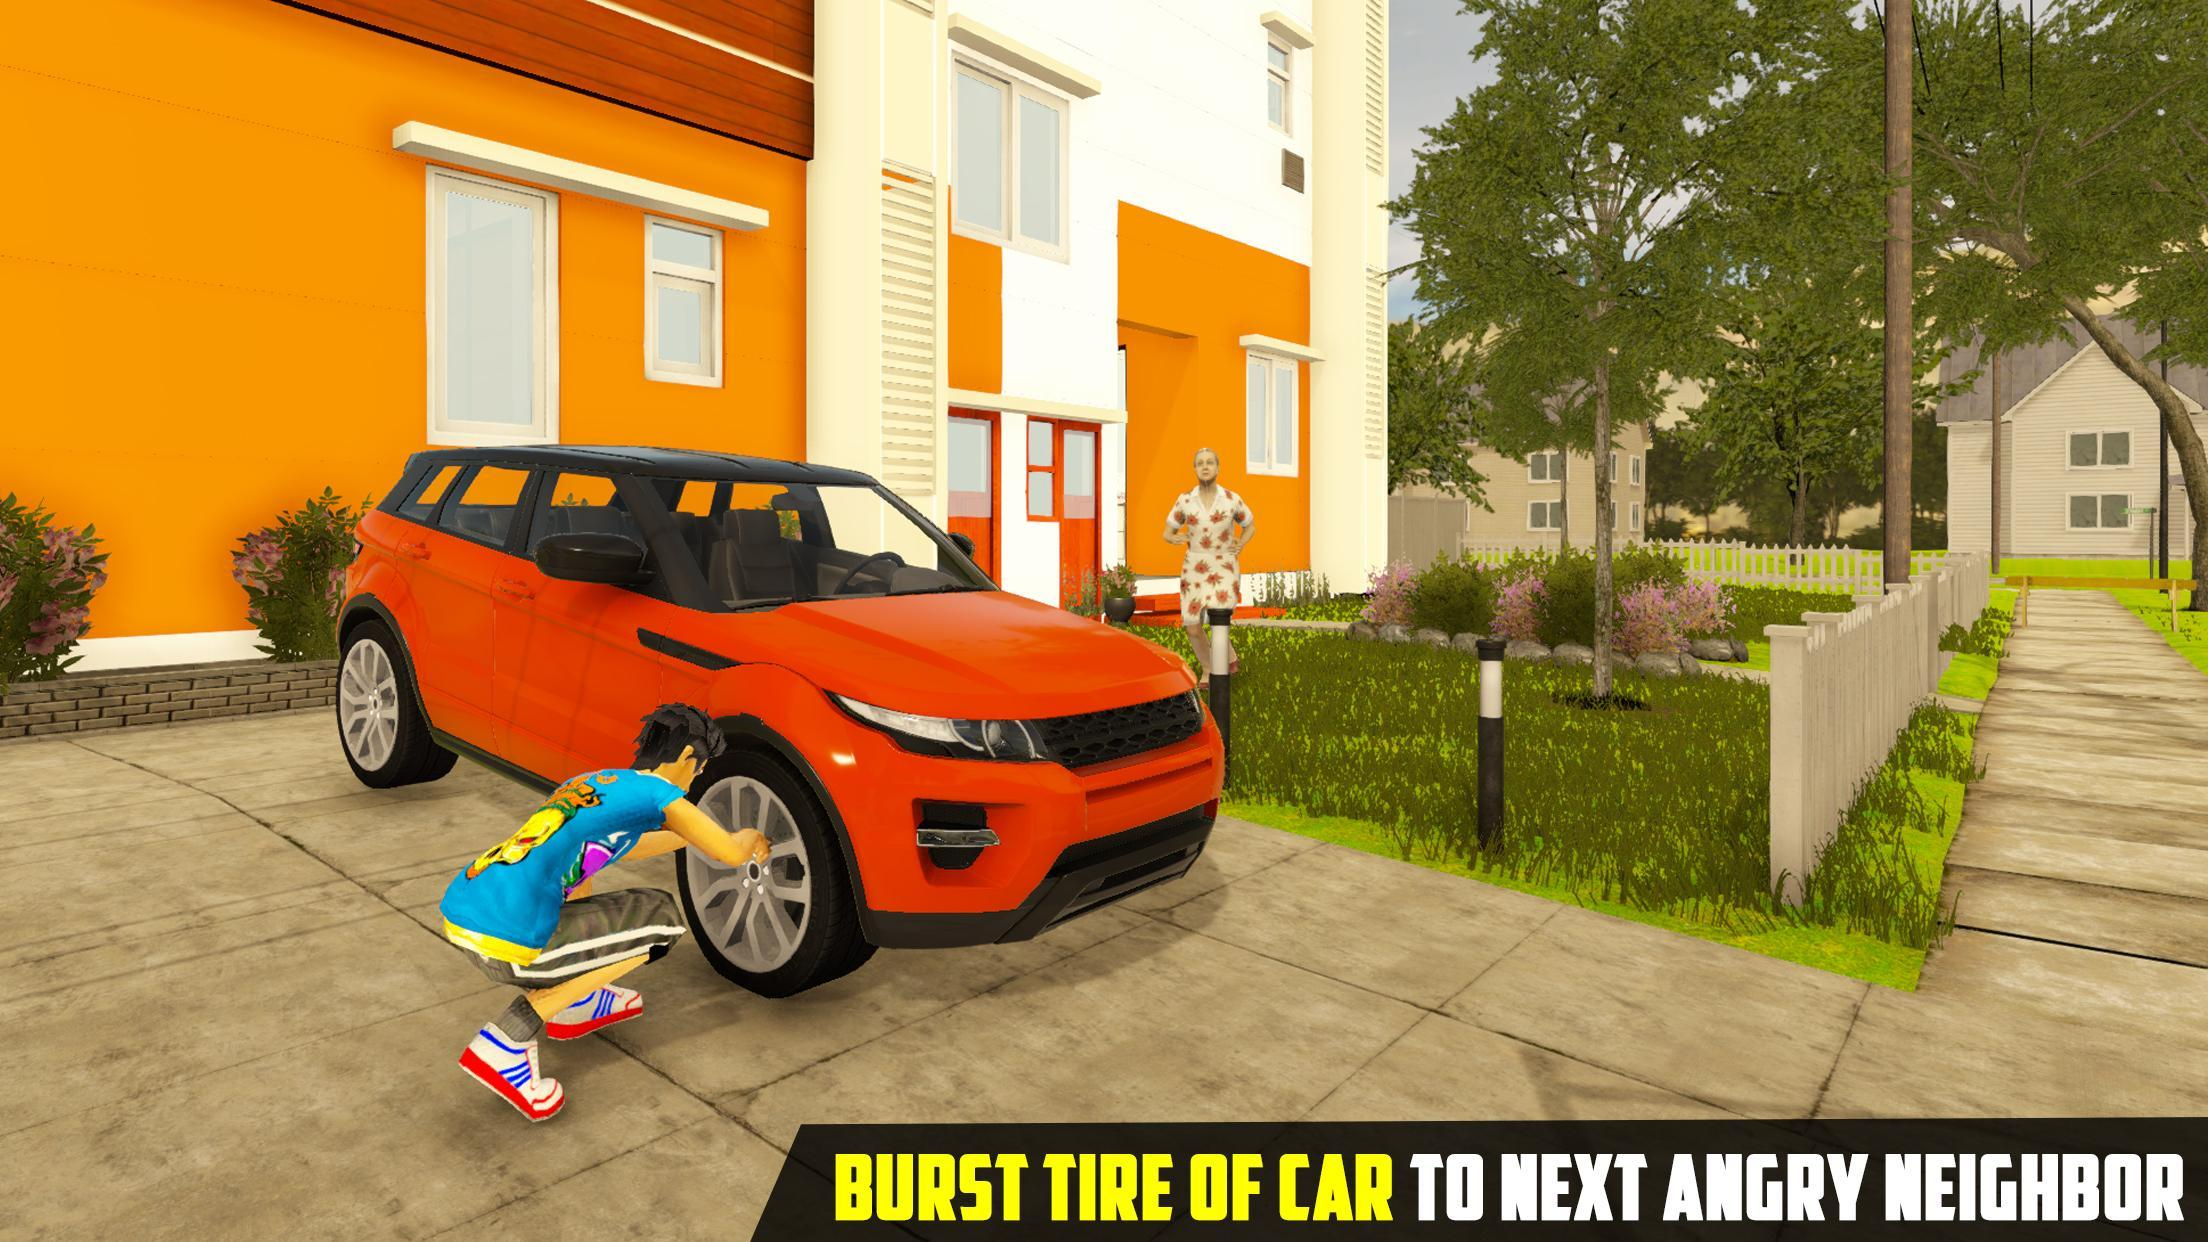 Virtual Bully Boys Next Angry Neighbor 1.4 Screenshot 6